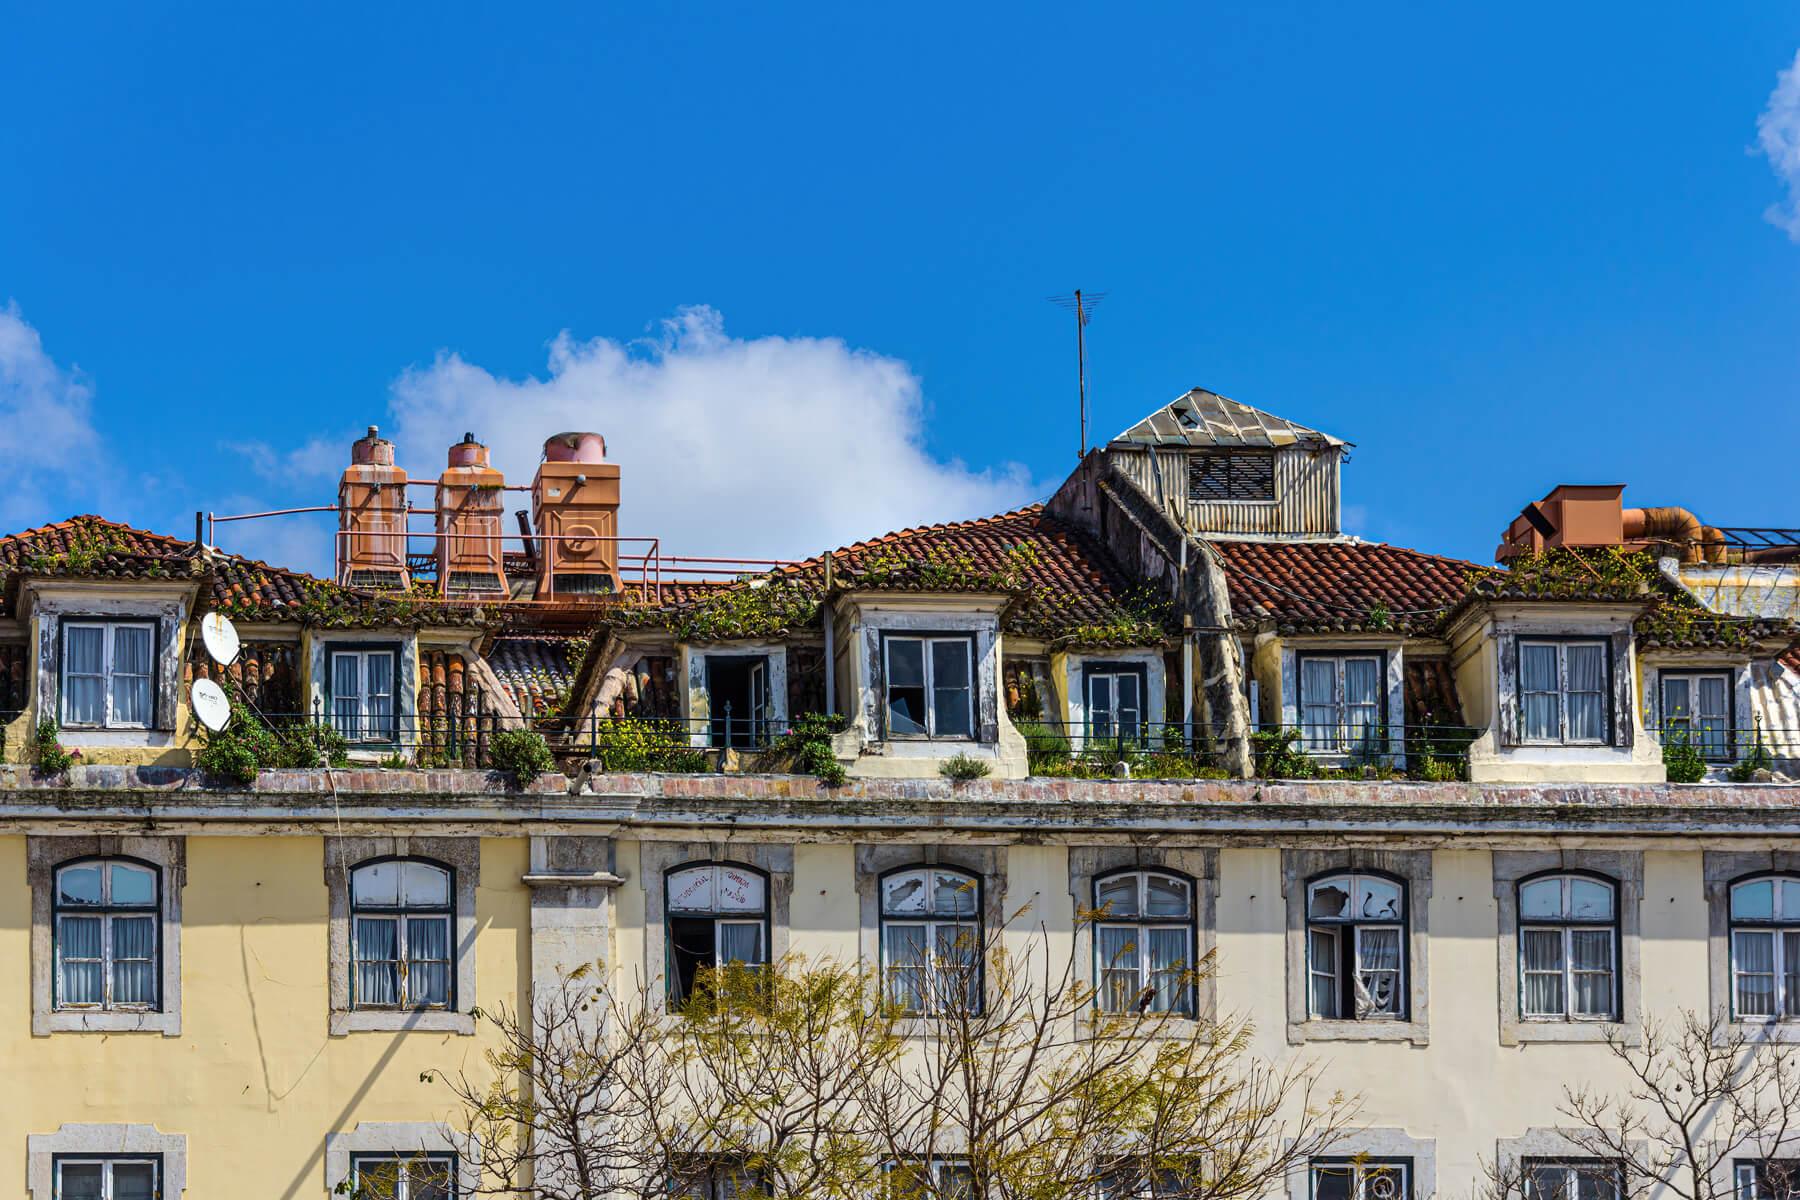 Former Glory of Lisbon, Portugal